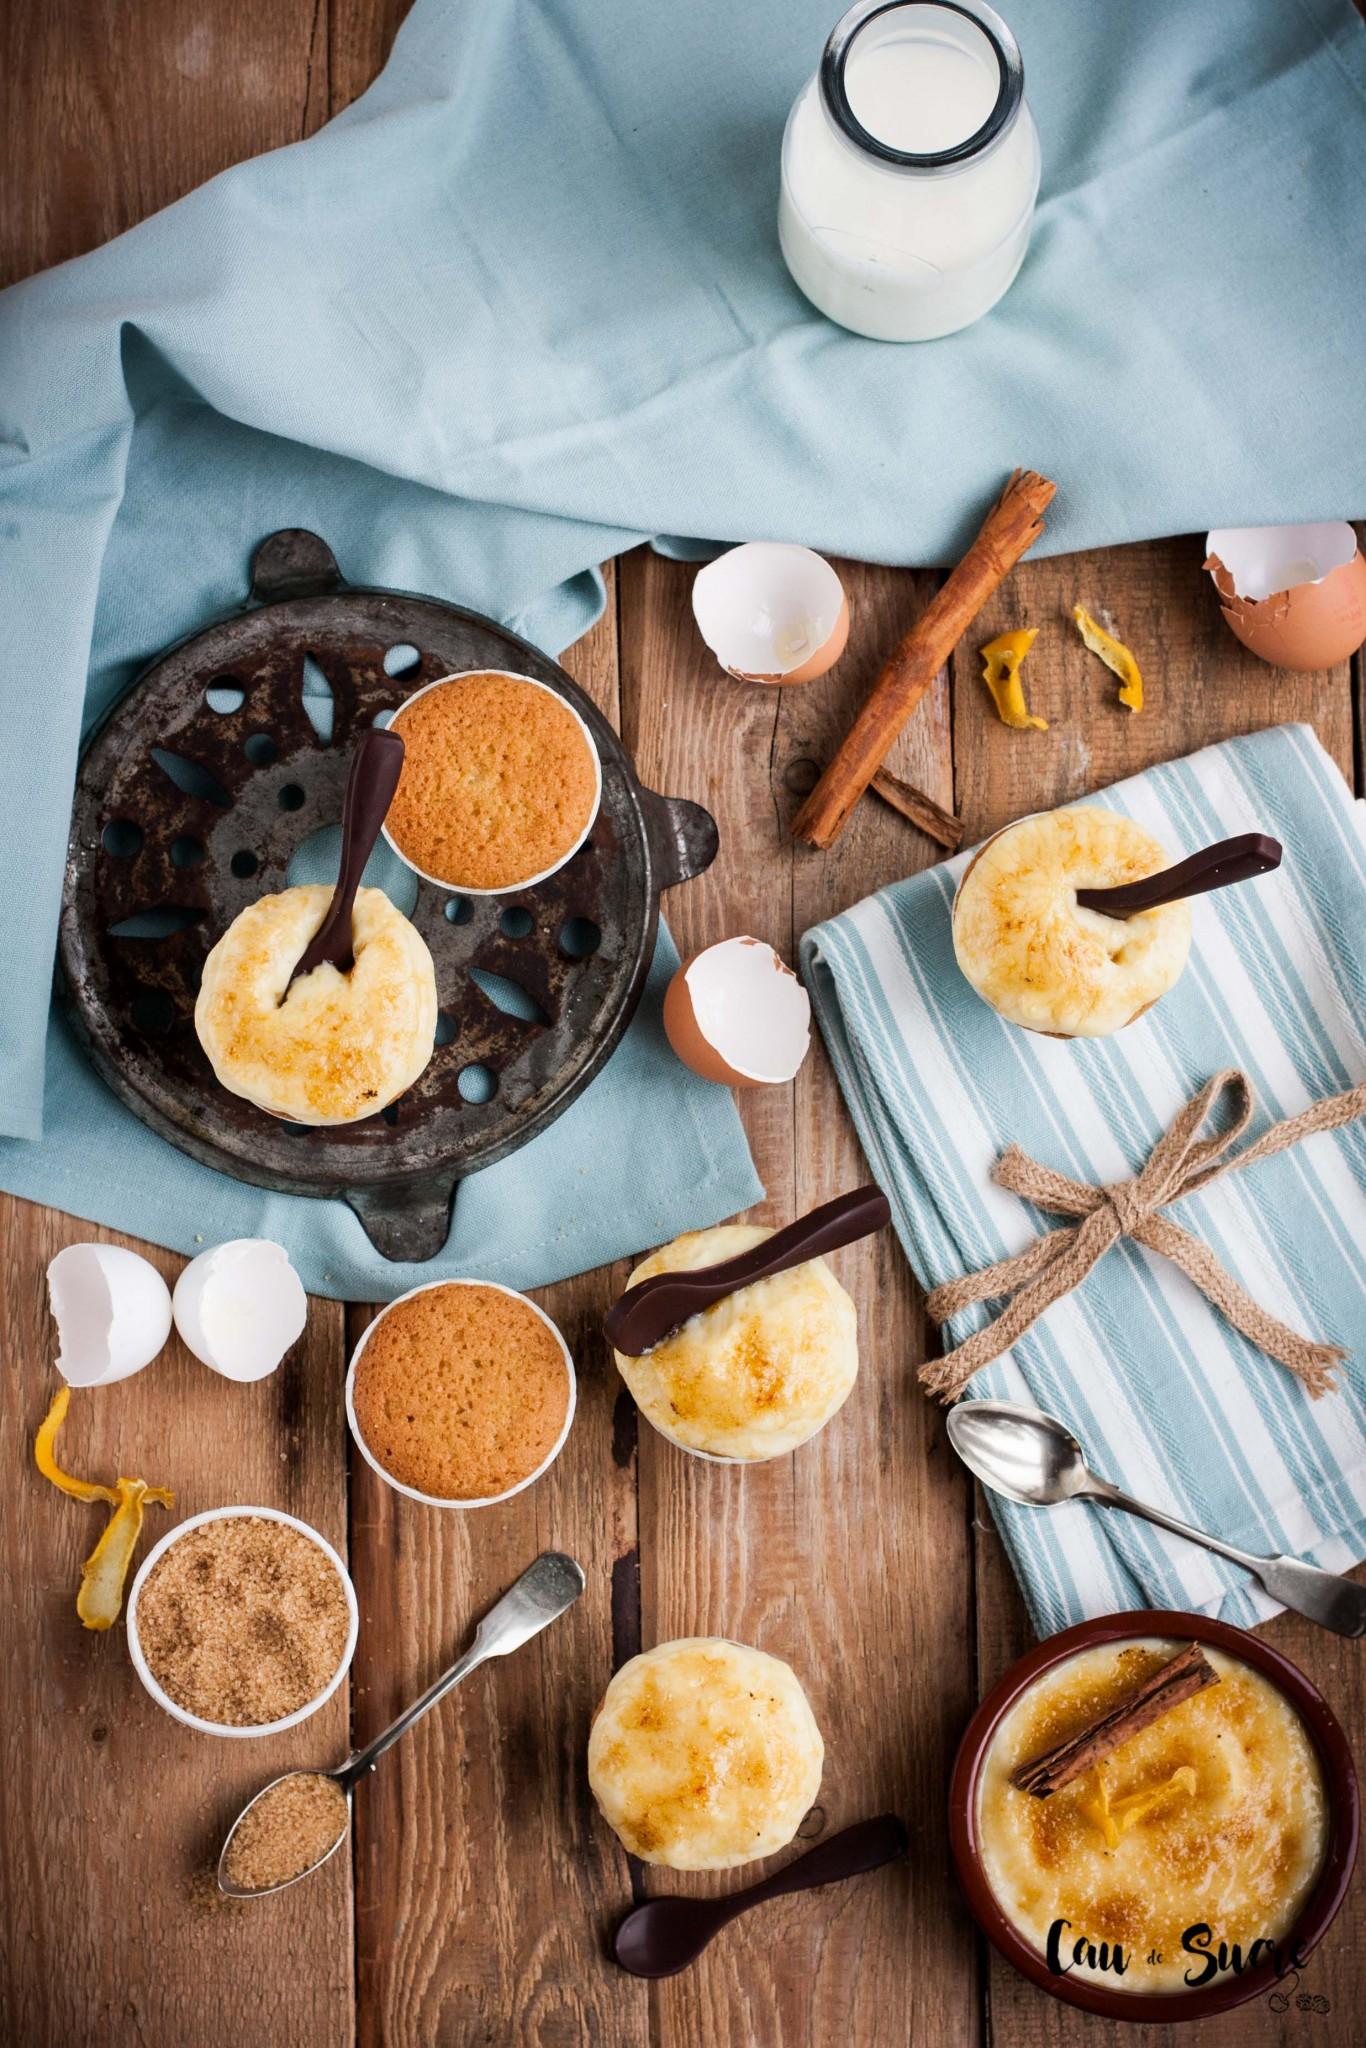 cupcakes_crema_catalana-2